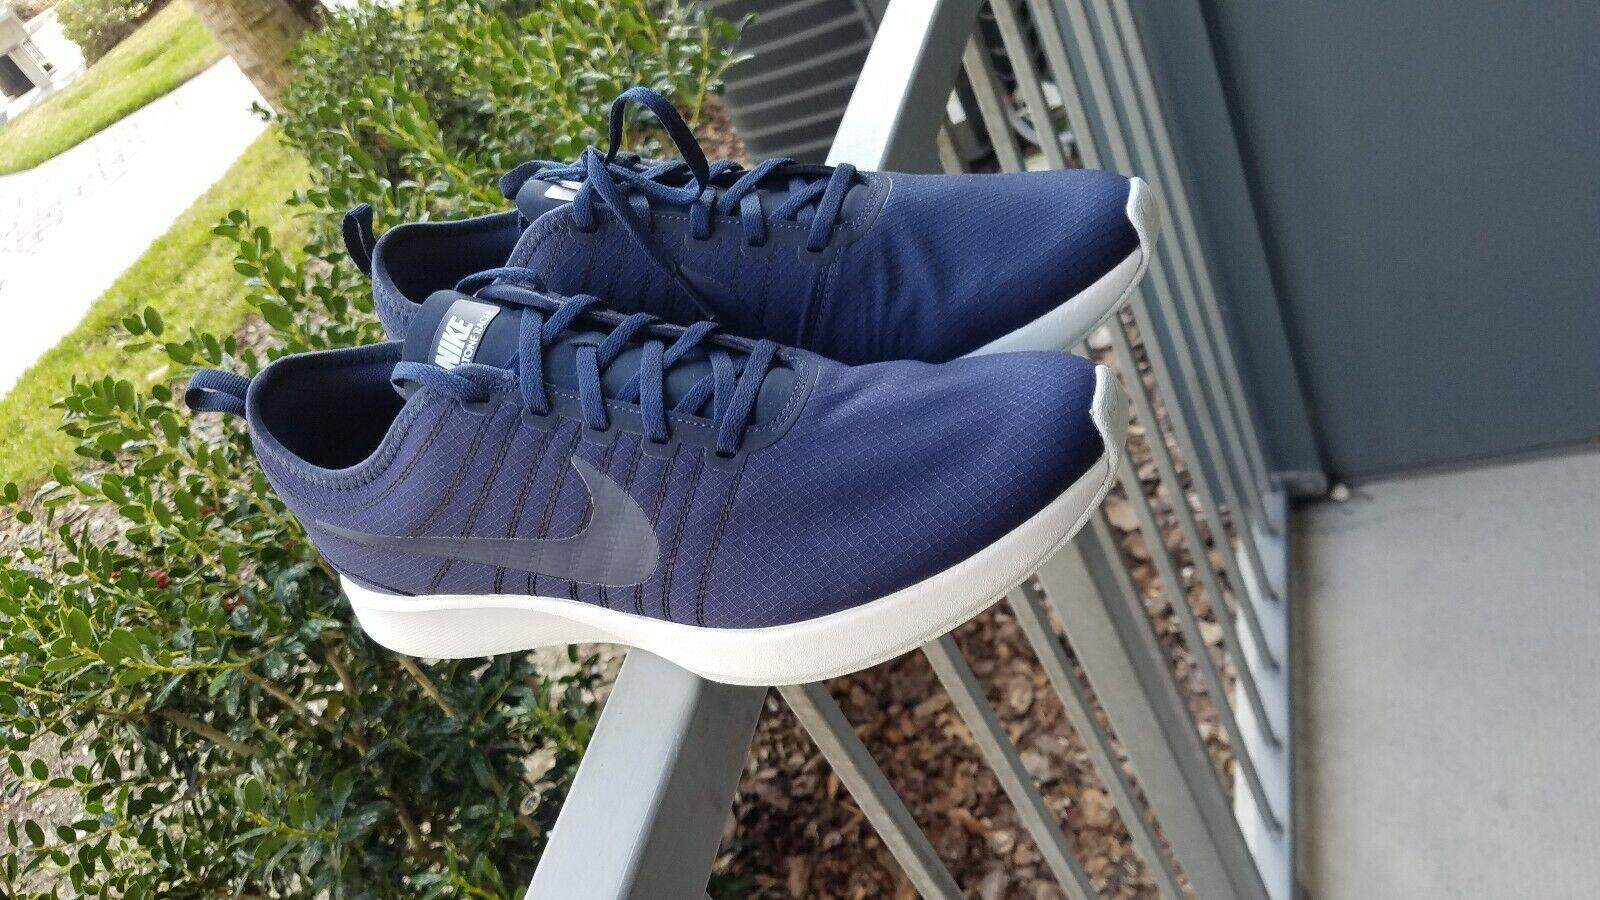 Nike Dualtone Racer SE 922170-400 Obsidian bluee Men's Running shoes Size 11.5